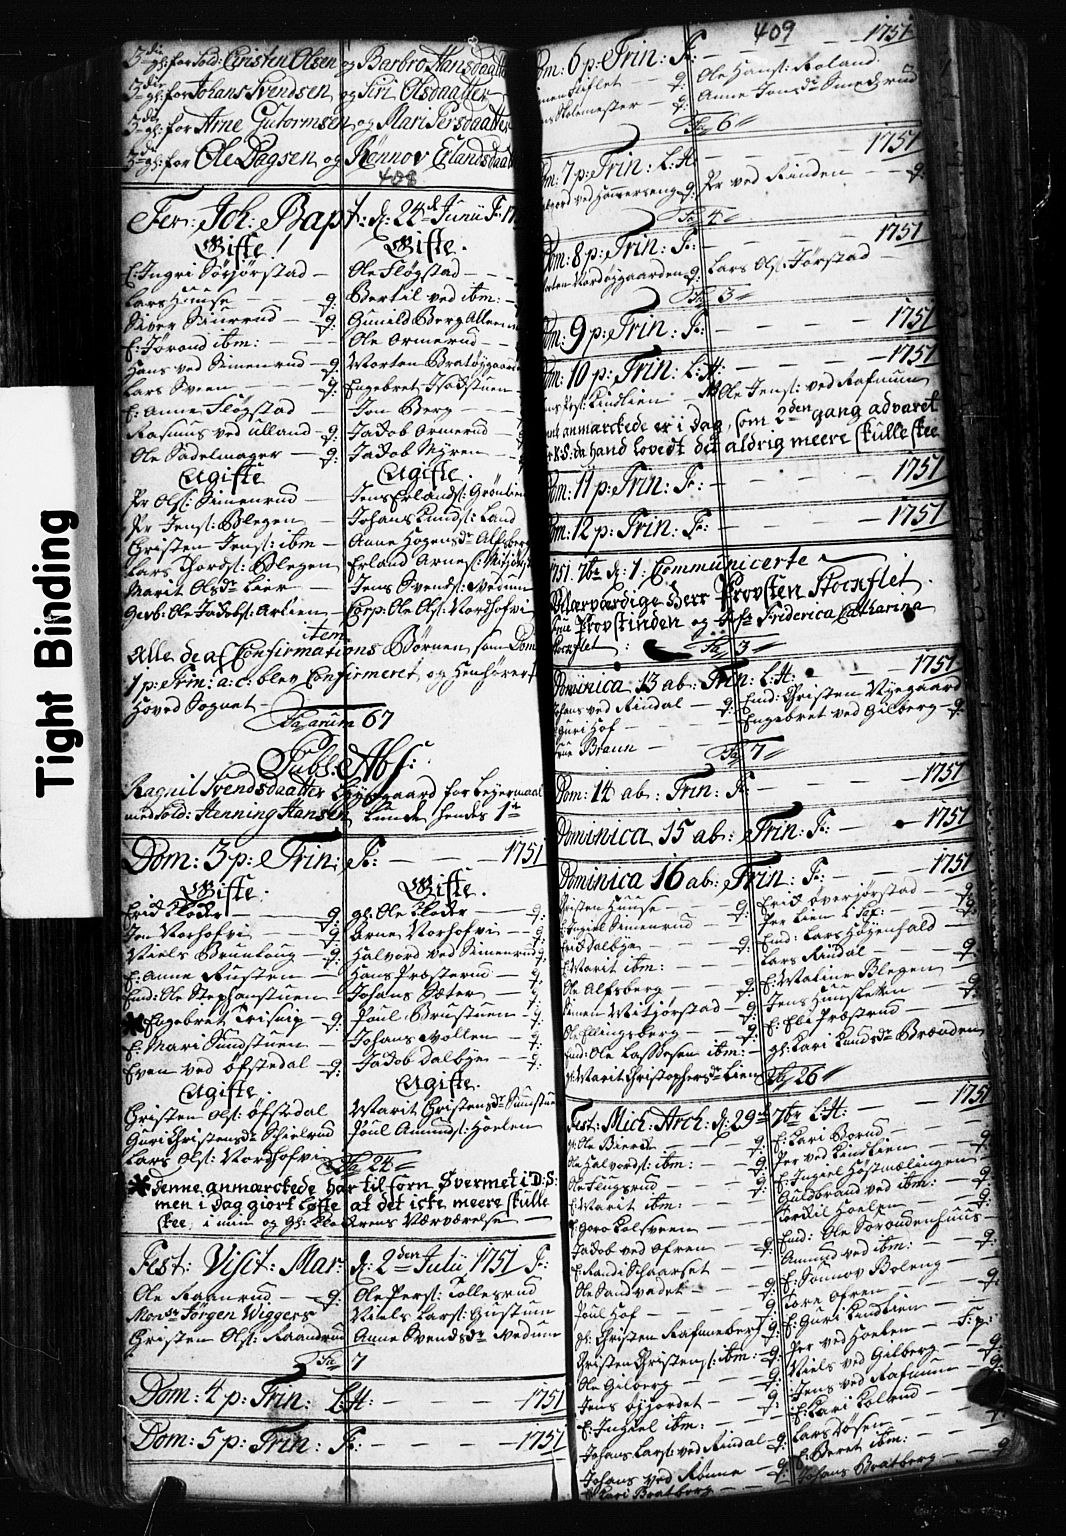 SAH, Fåberg prestekontor, Klokkerbok nr. 2, 1741-1756, s. 408-409